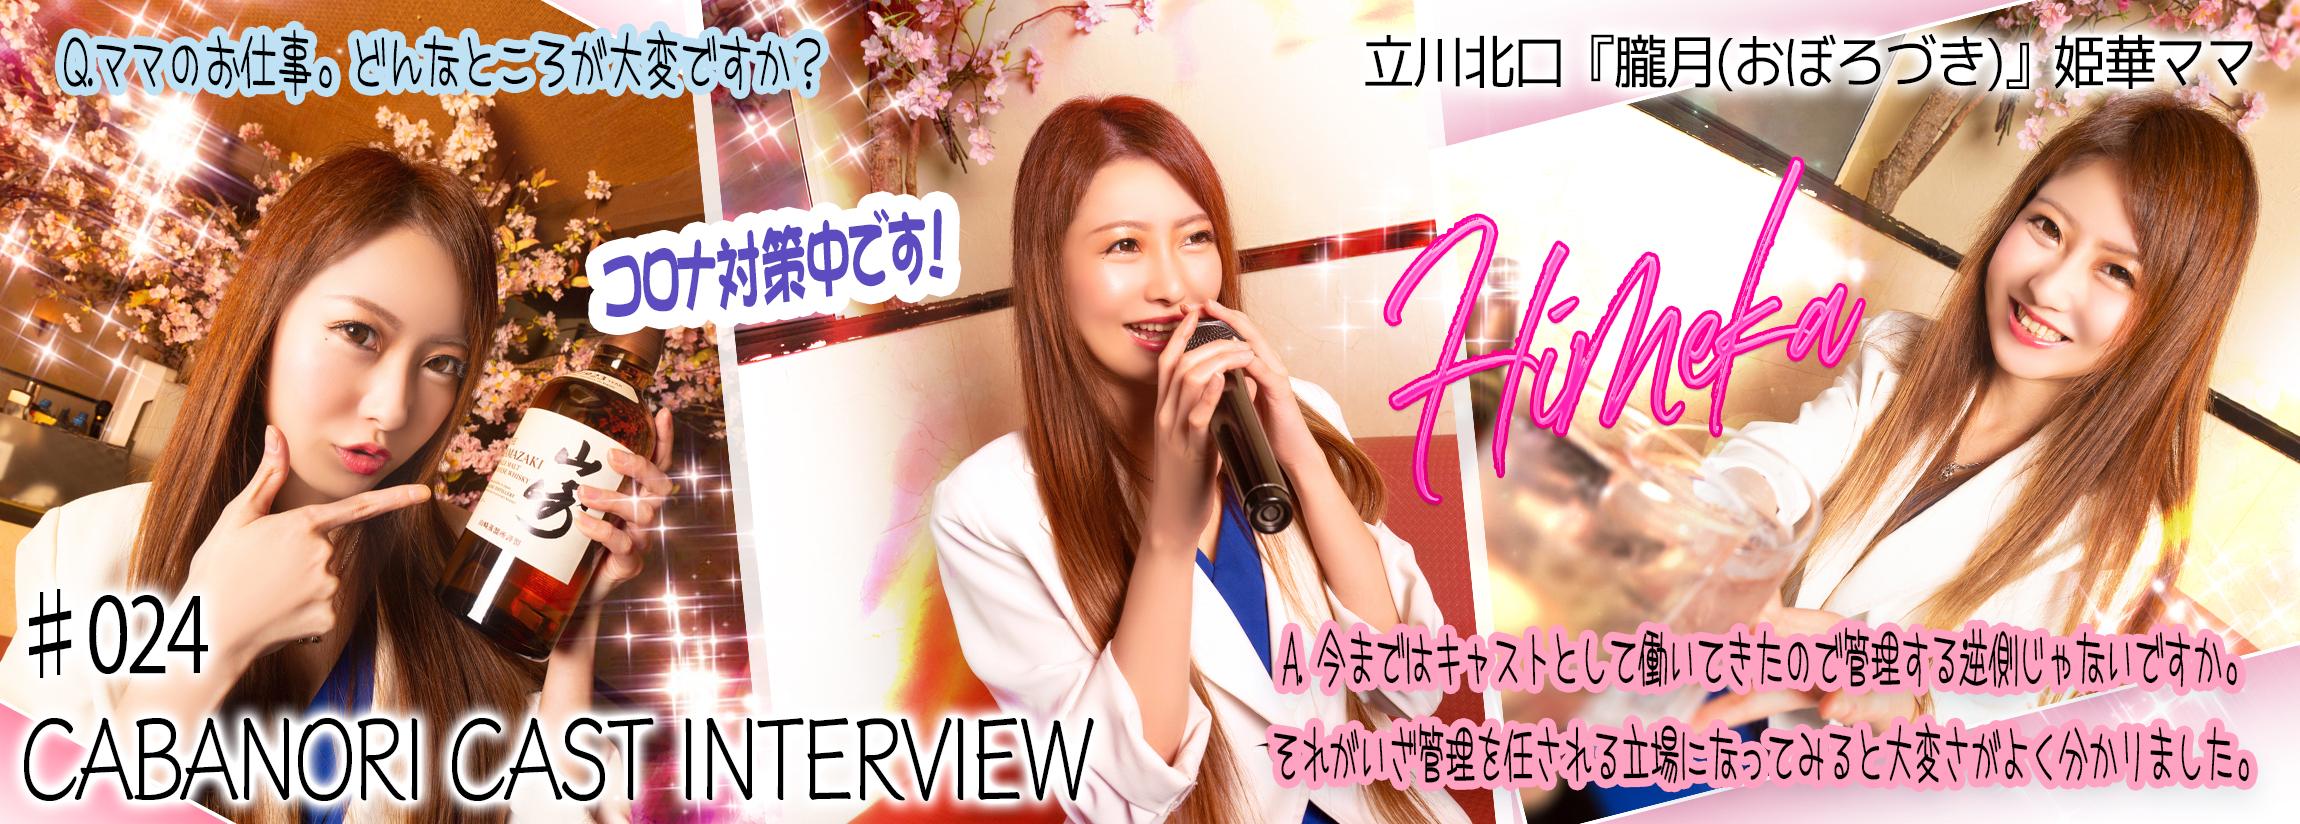 【CAST INTERVIEW】立川北口『朧月(おぼろづき)』姫華ママ